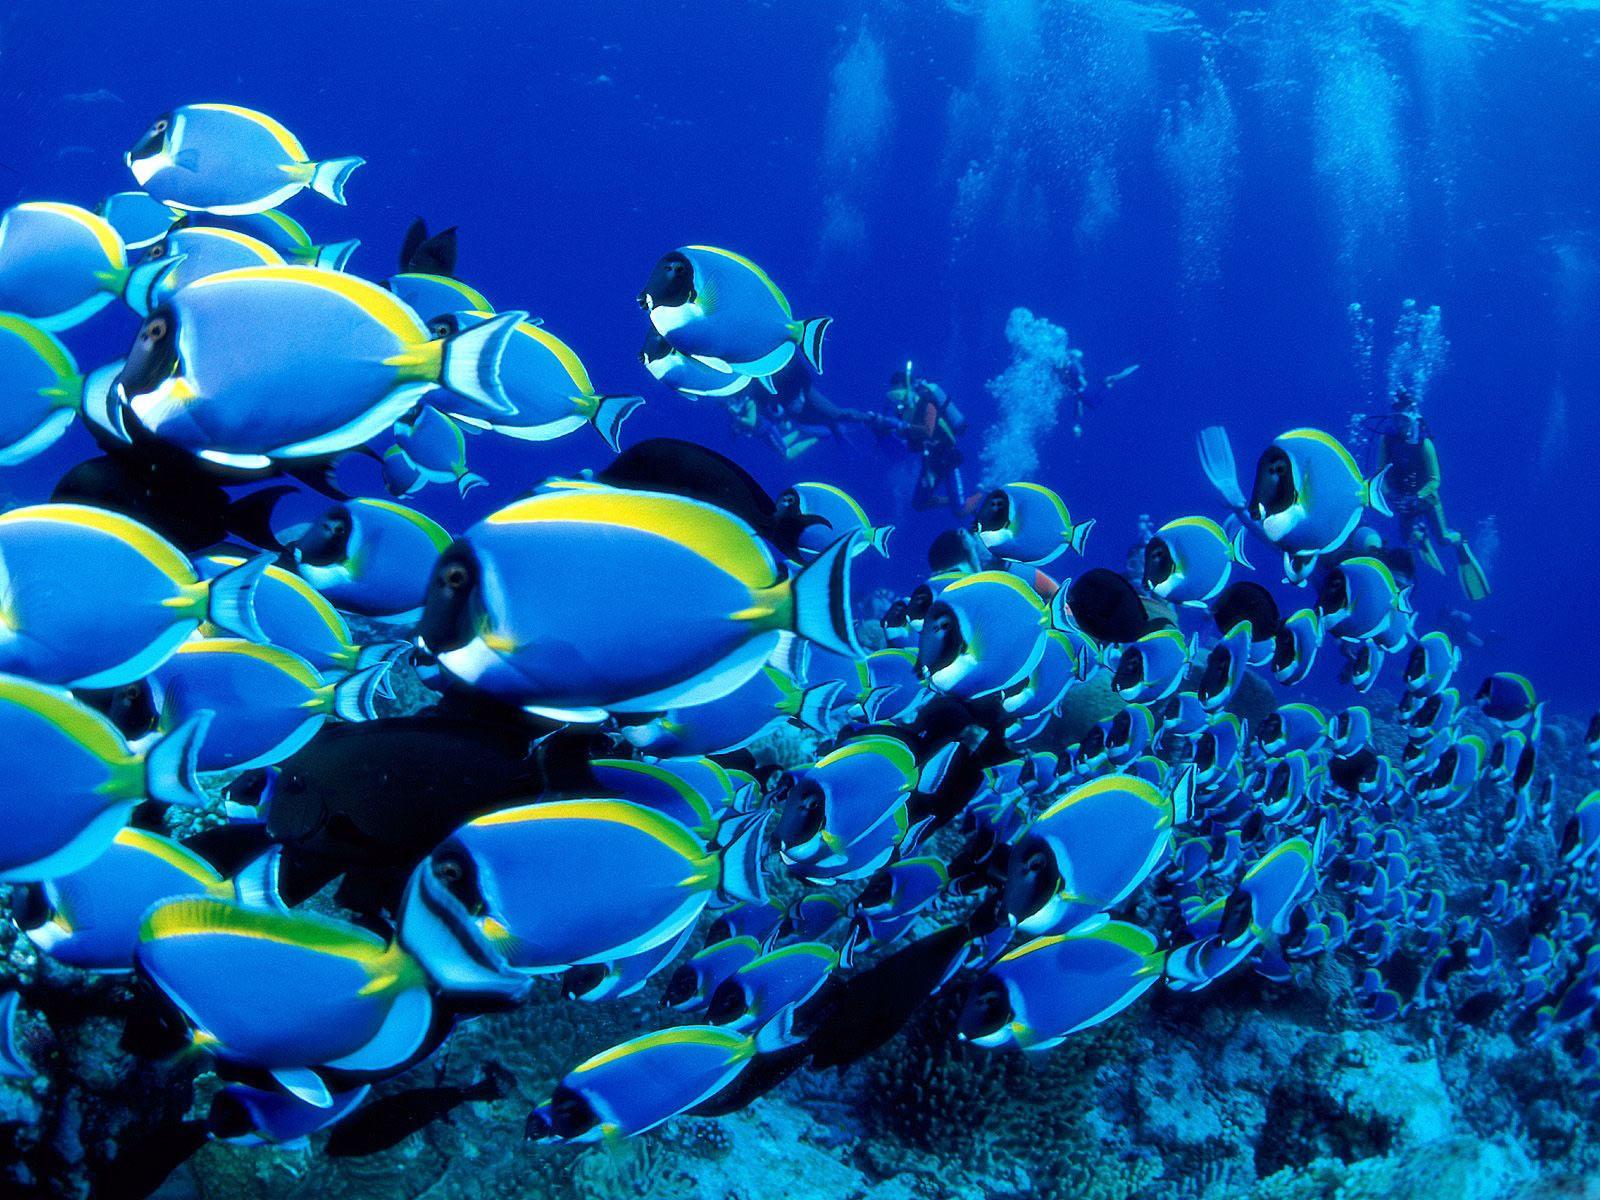 67 Underwater Wallpapers On Wallpapersafari